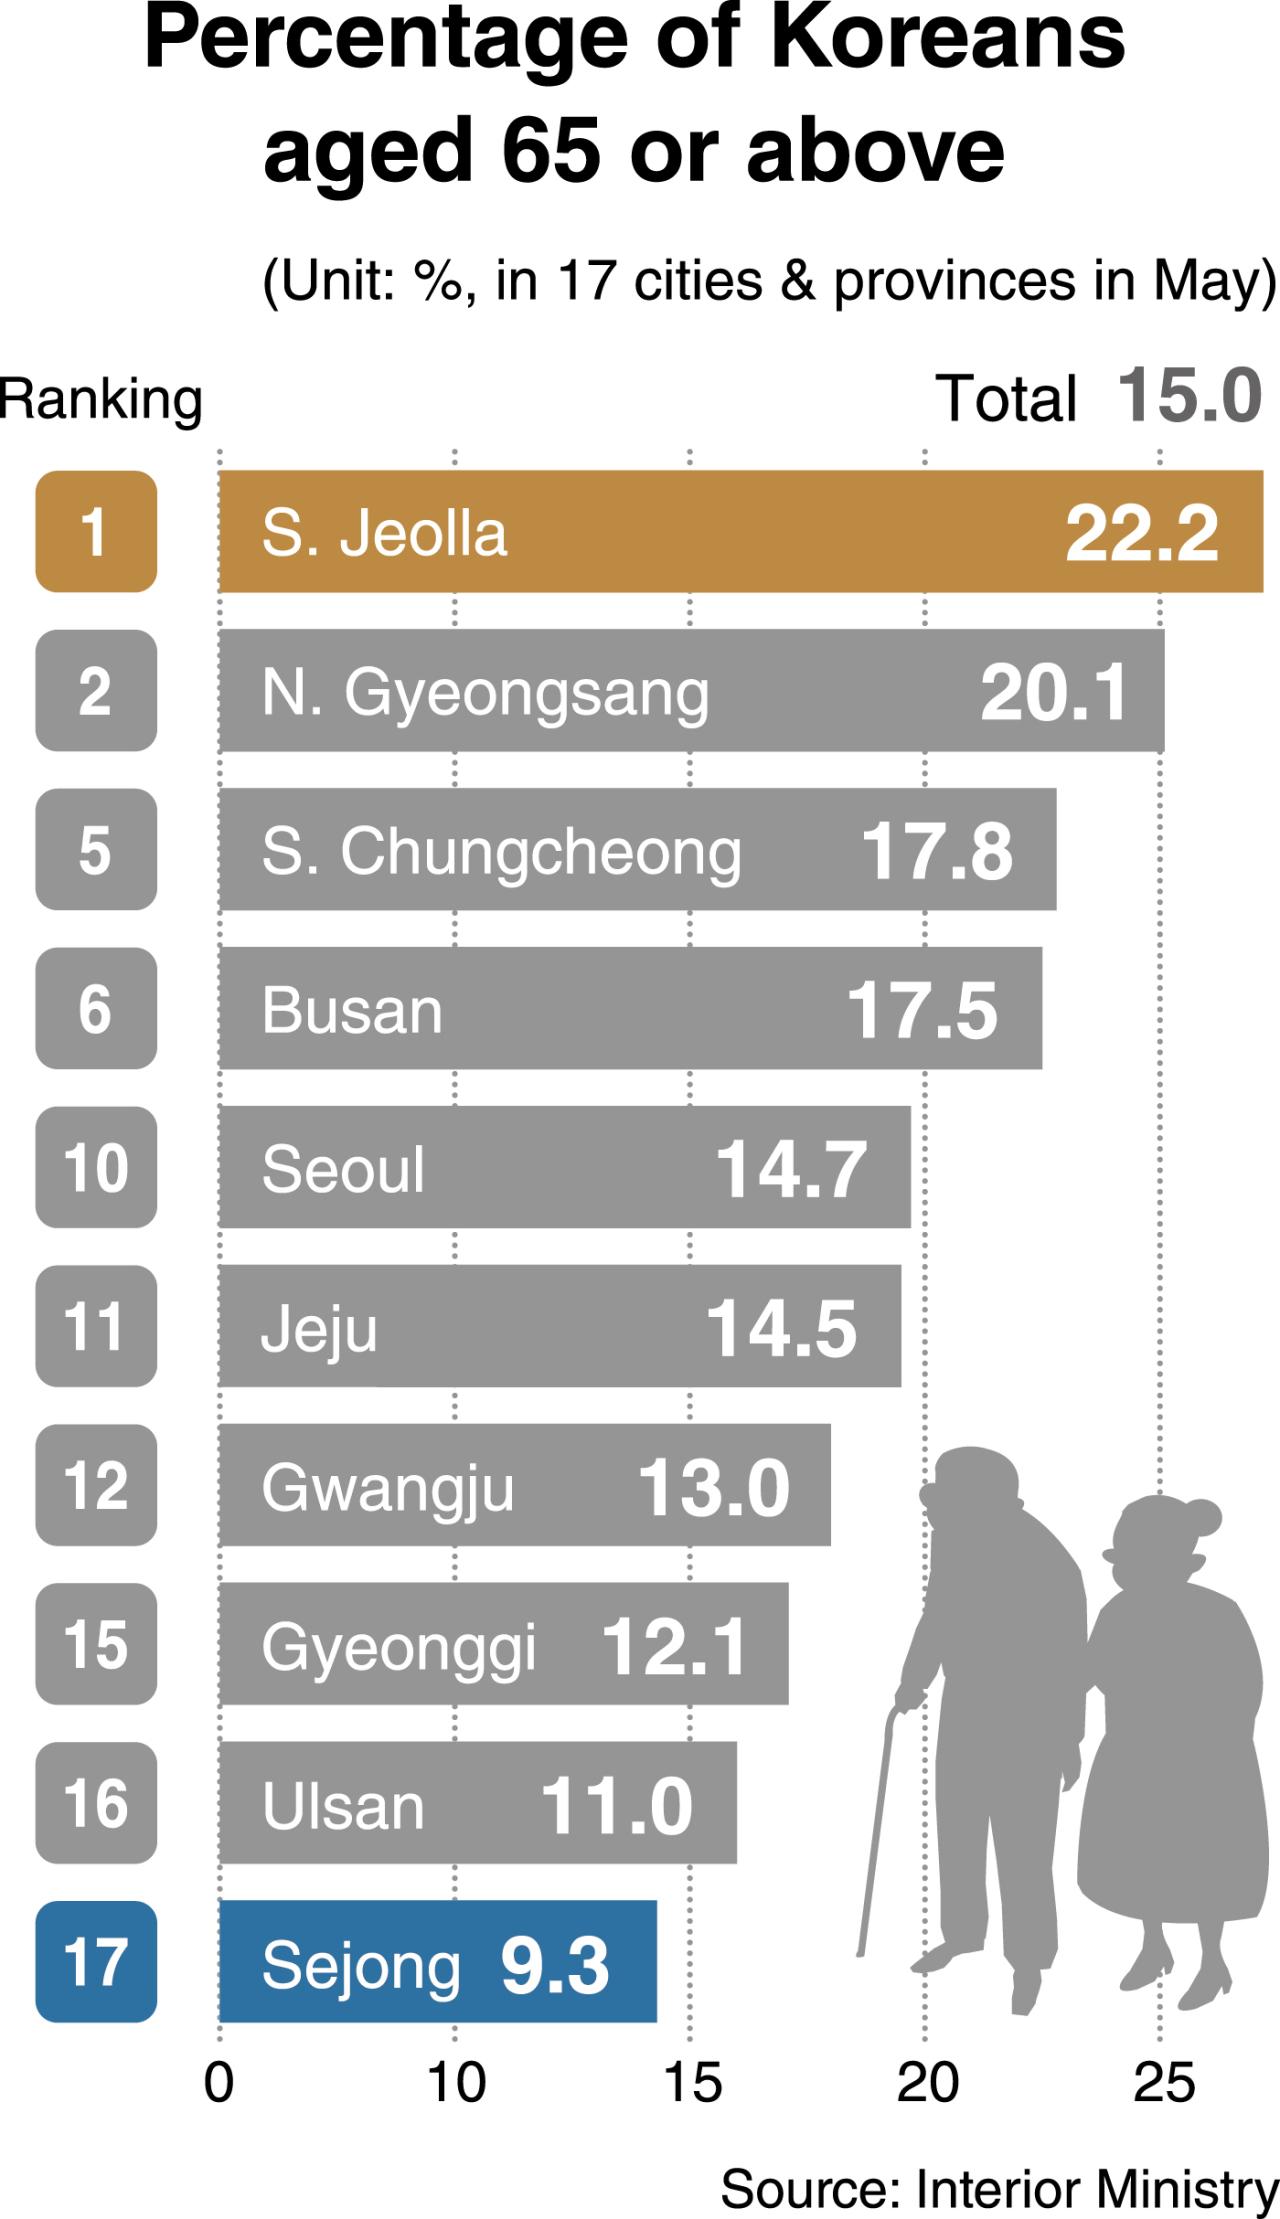 (Graphic by Heo Tae-seong/The Korea Herald)